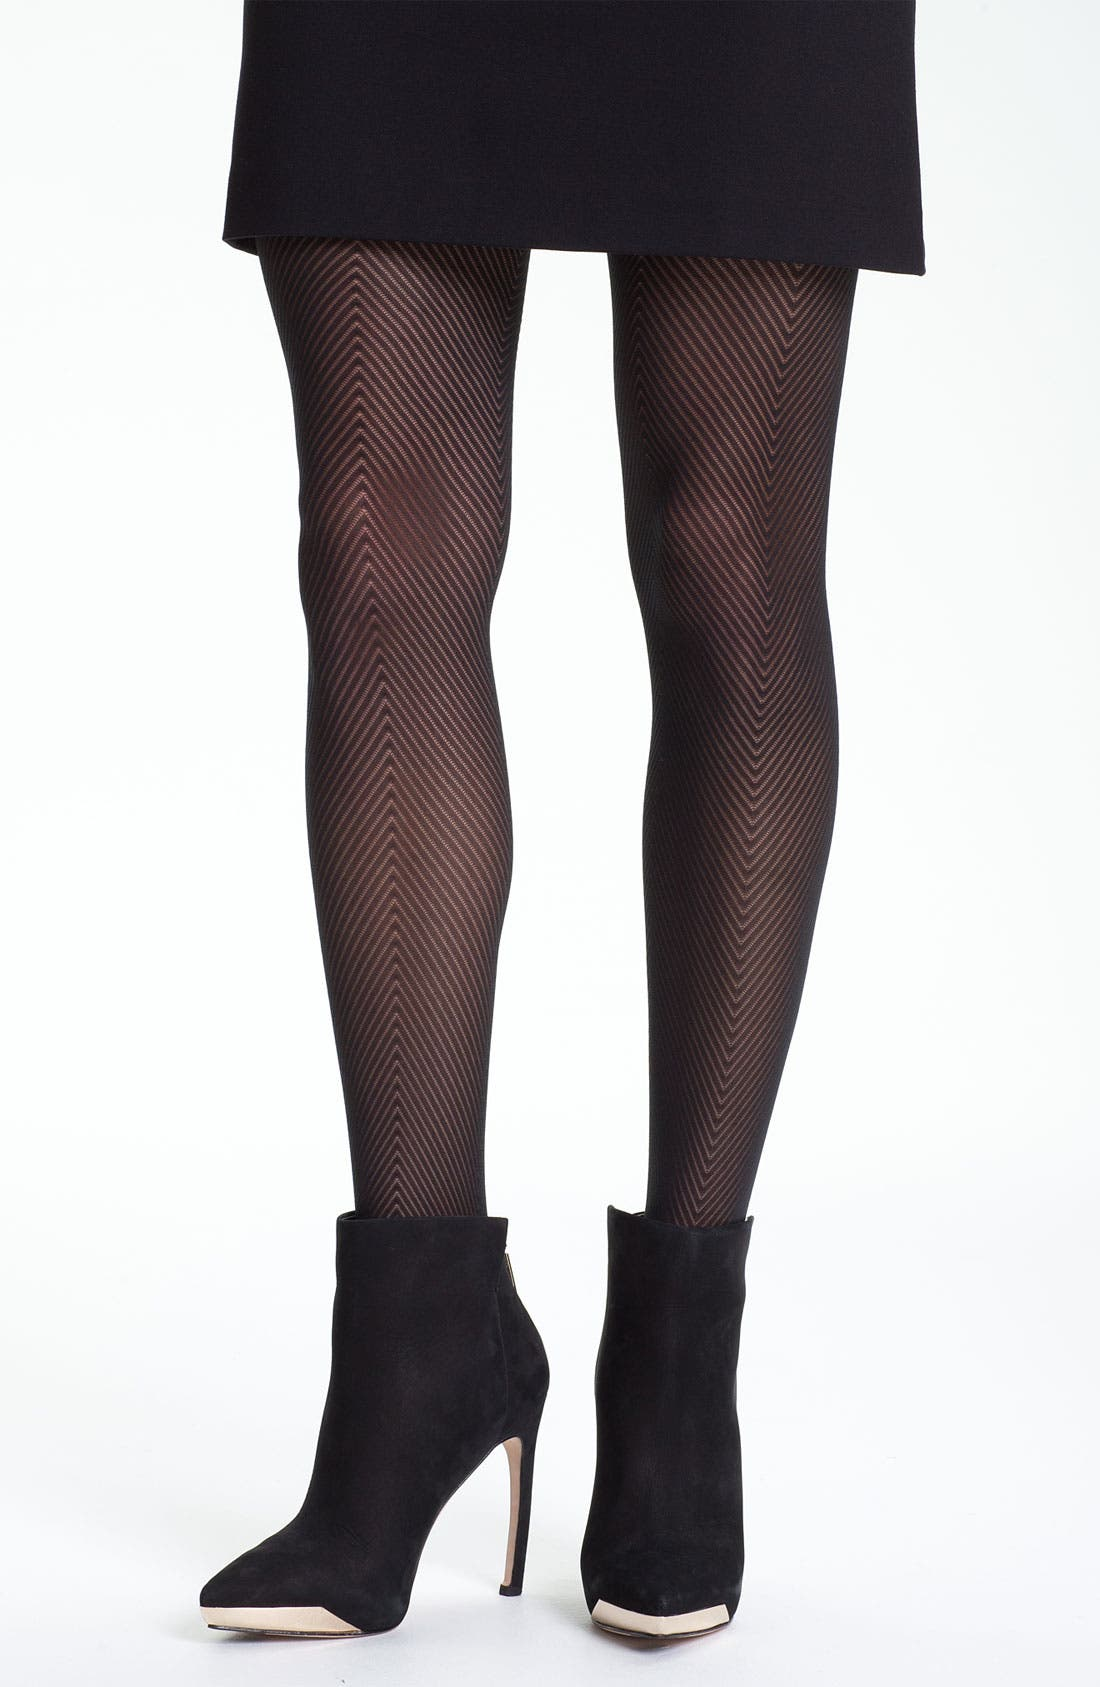 Main Image - Calvin Klein 'Overscale Herringbone' Tights